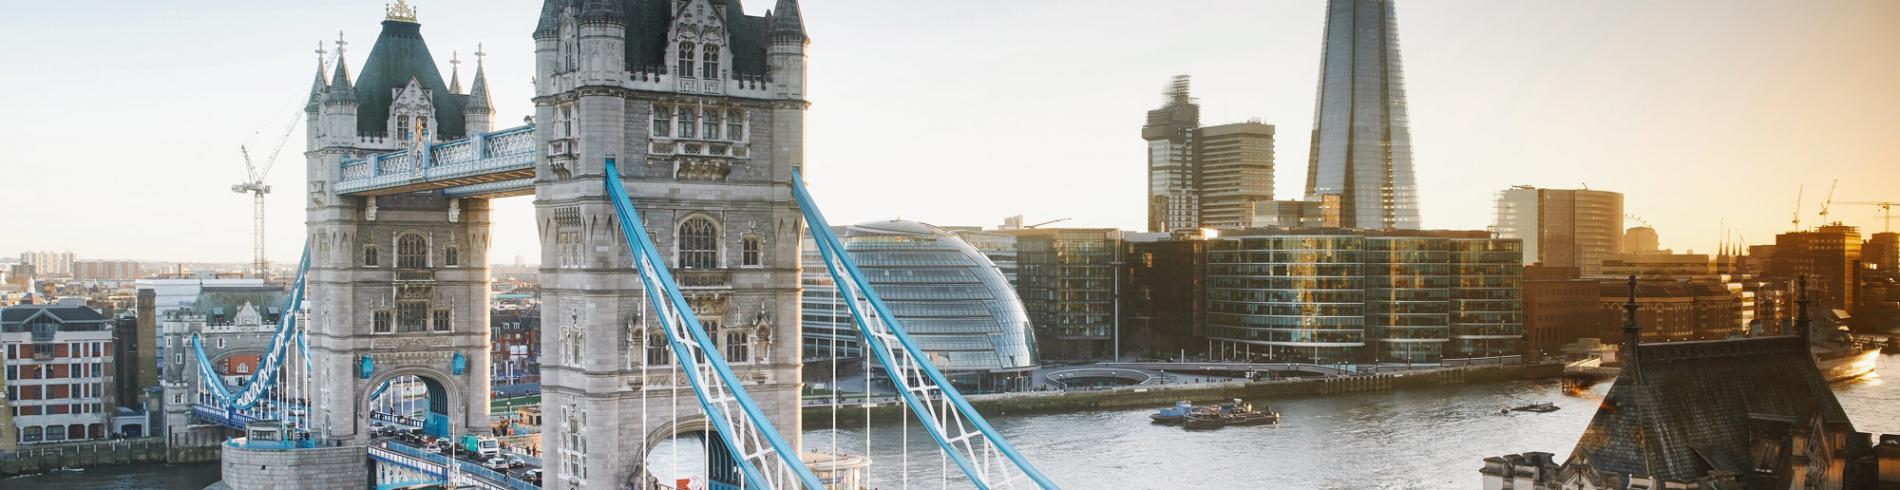 Tower Bridge, City Hall and the Shard